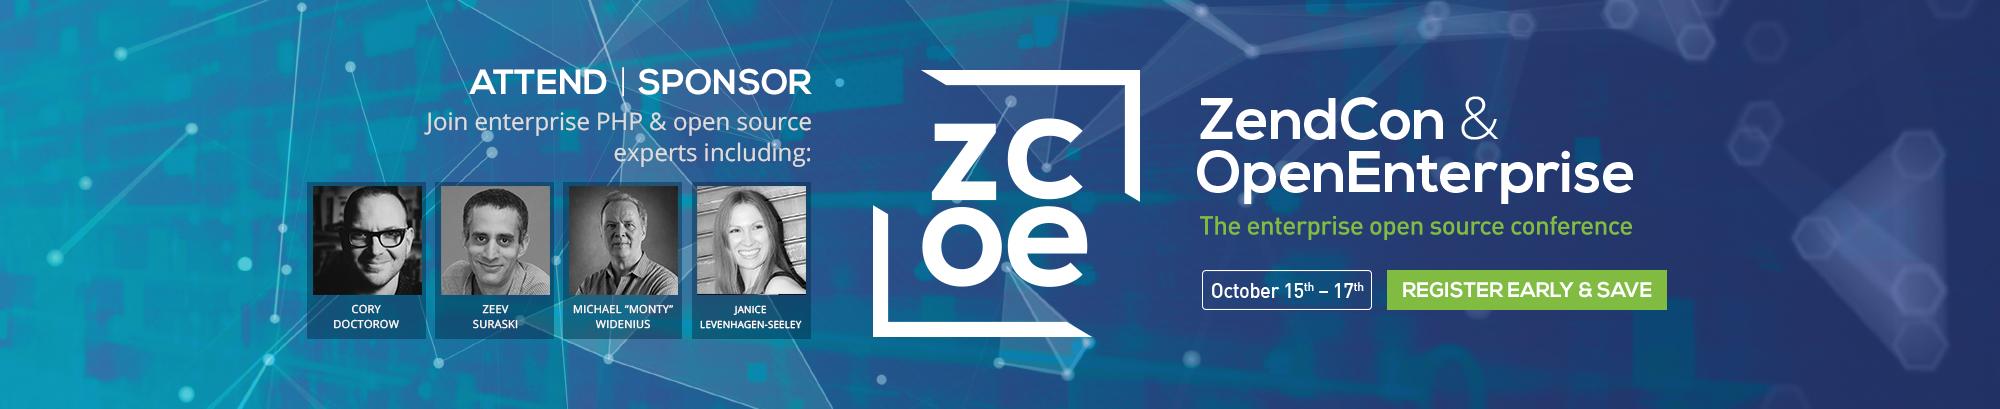 ZendCon & OpenEnterprise